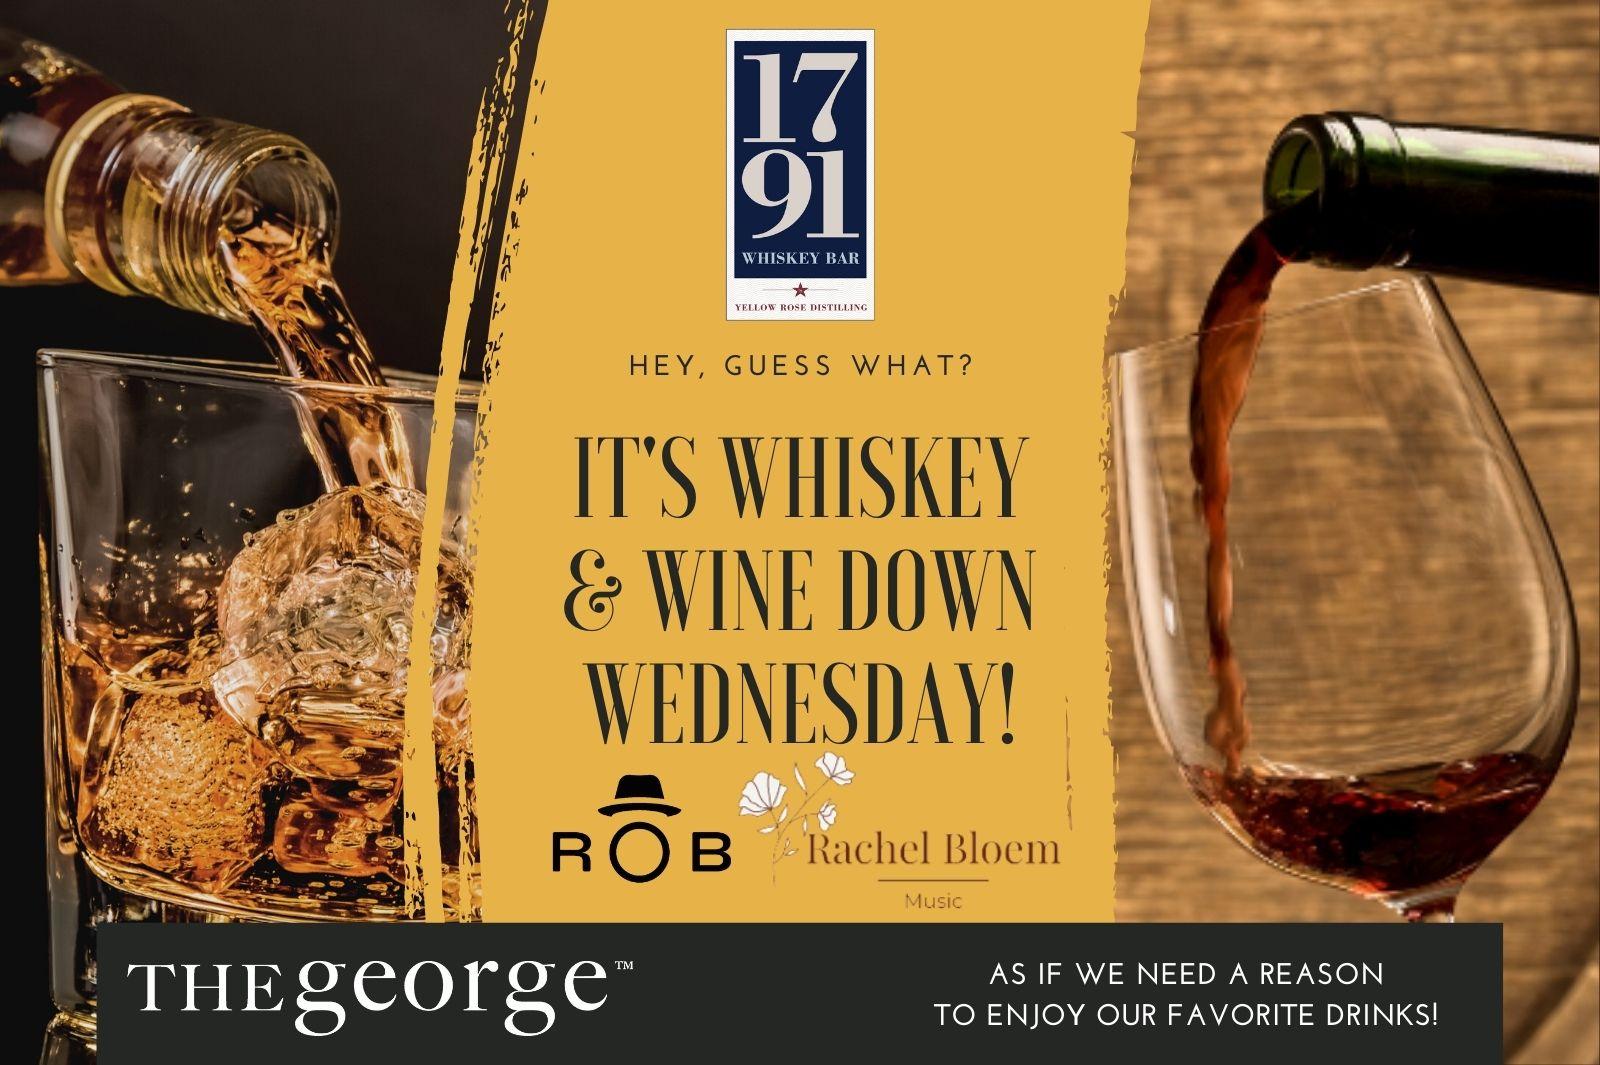 Whiskey & Wine Wednesday Events